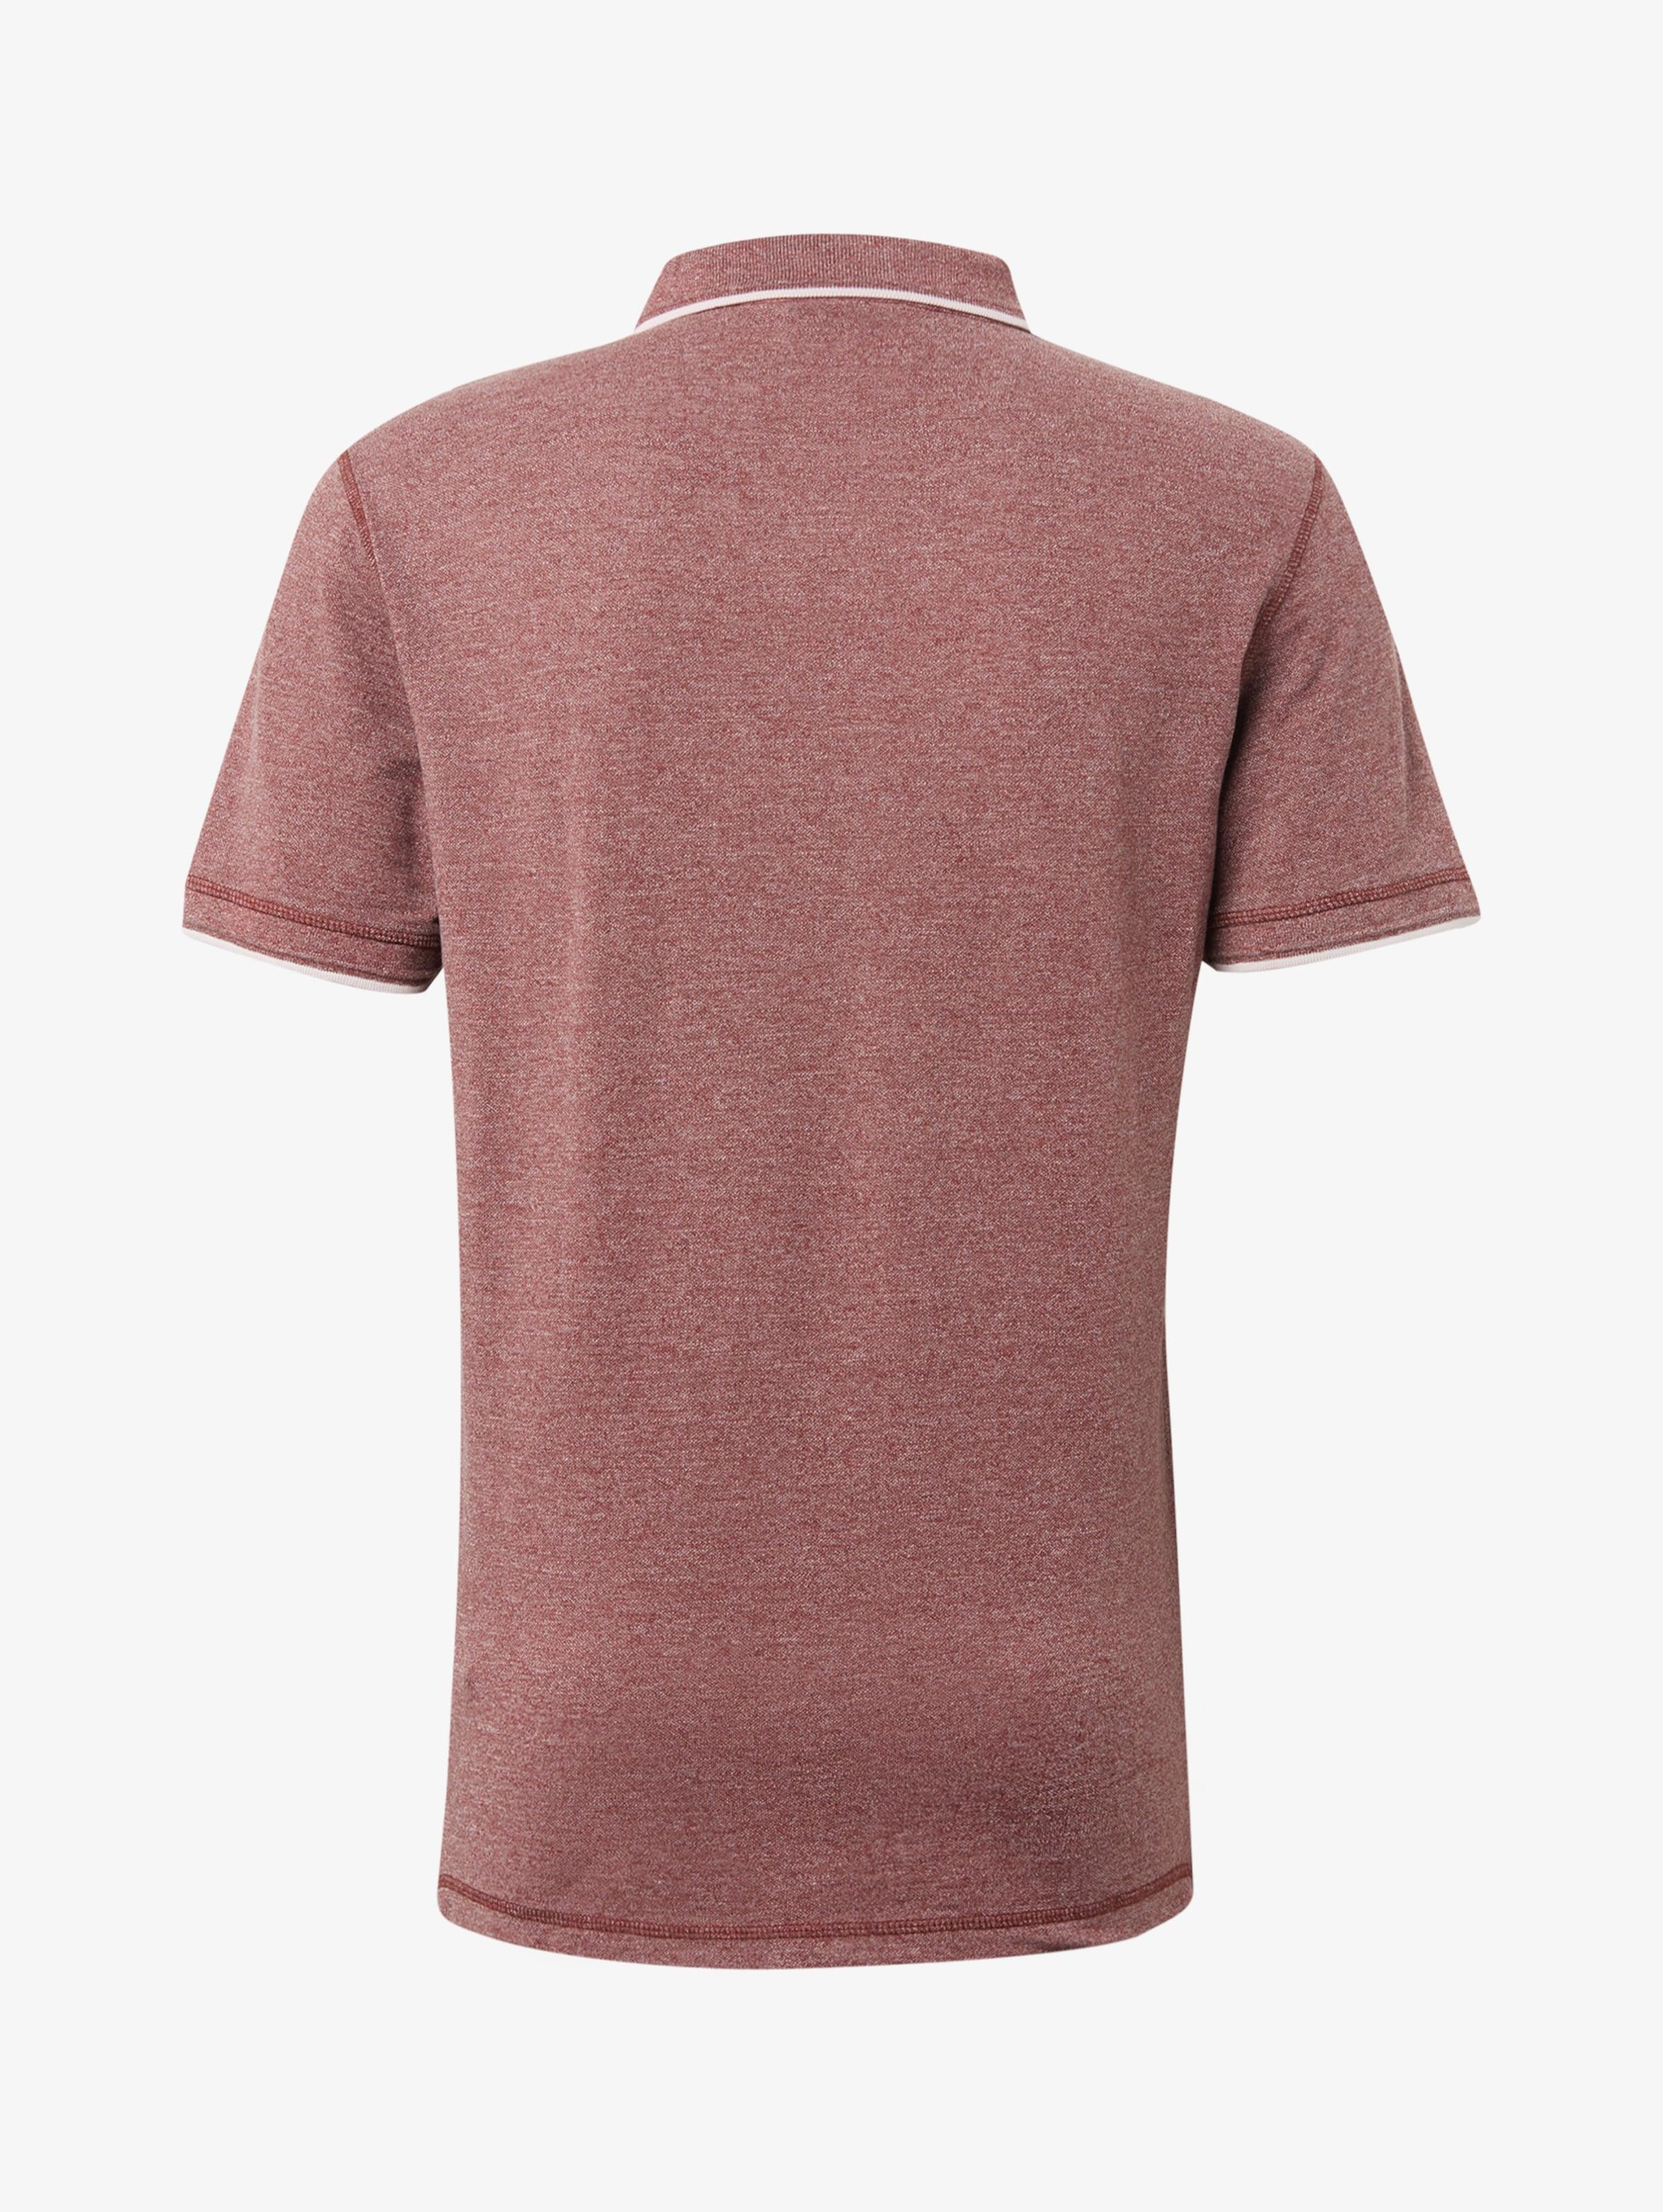 In Shirt Shirt Tom In Tom BlutrotWeiß Tom Tailor Tailor Tailor BlutrotWeiß QrtshCxd